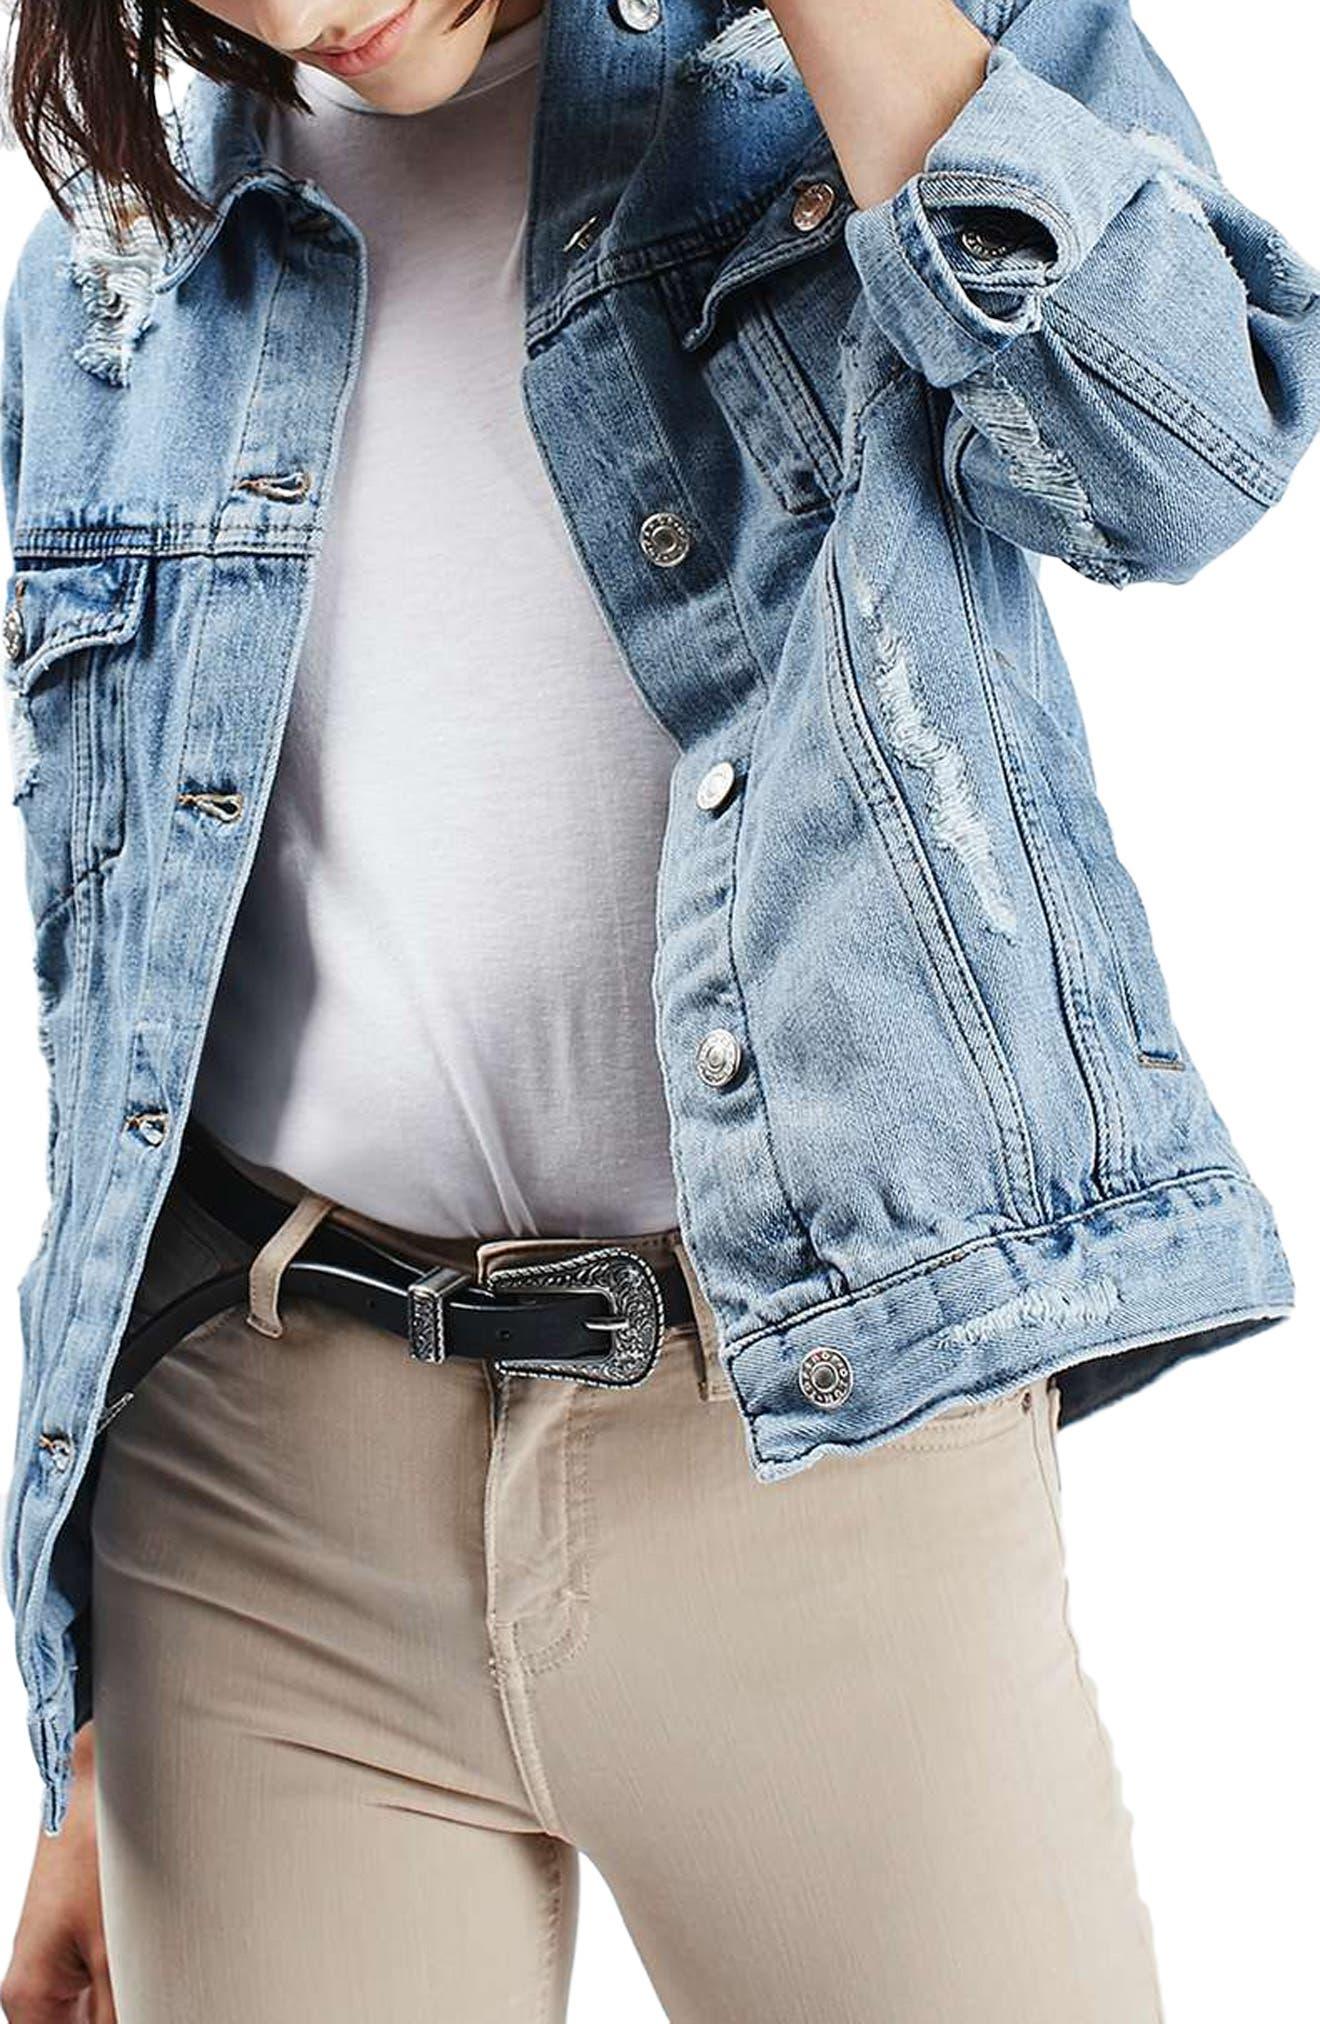 TOPSHOP, Moto Ripped Oversize Denim Jacket, Main thumbnail 1, color, 400